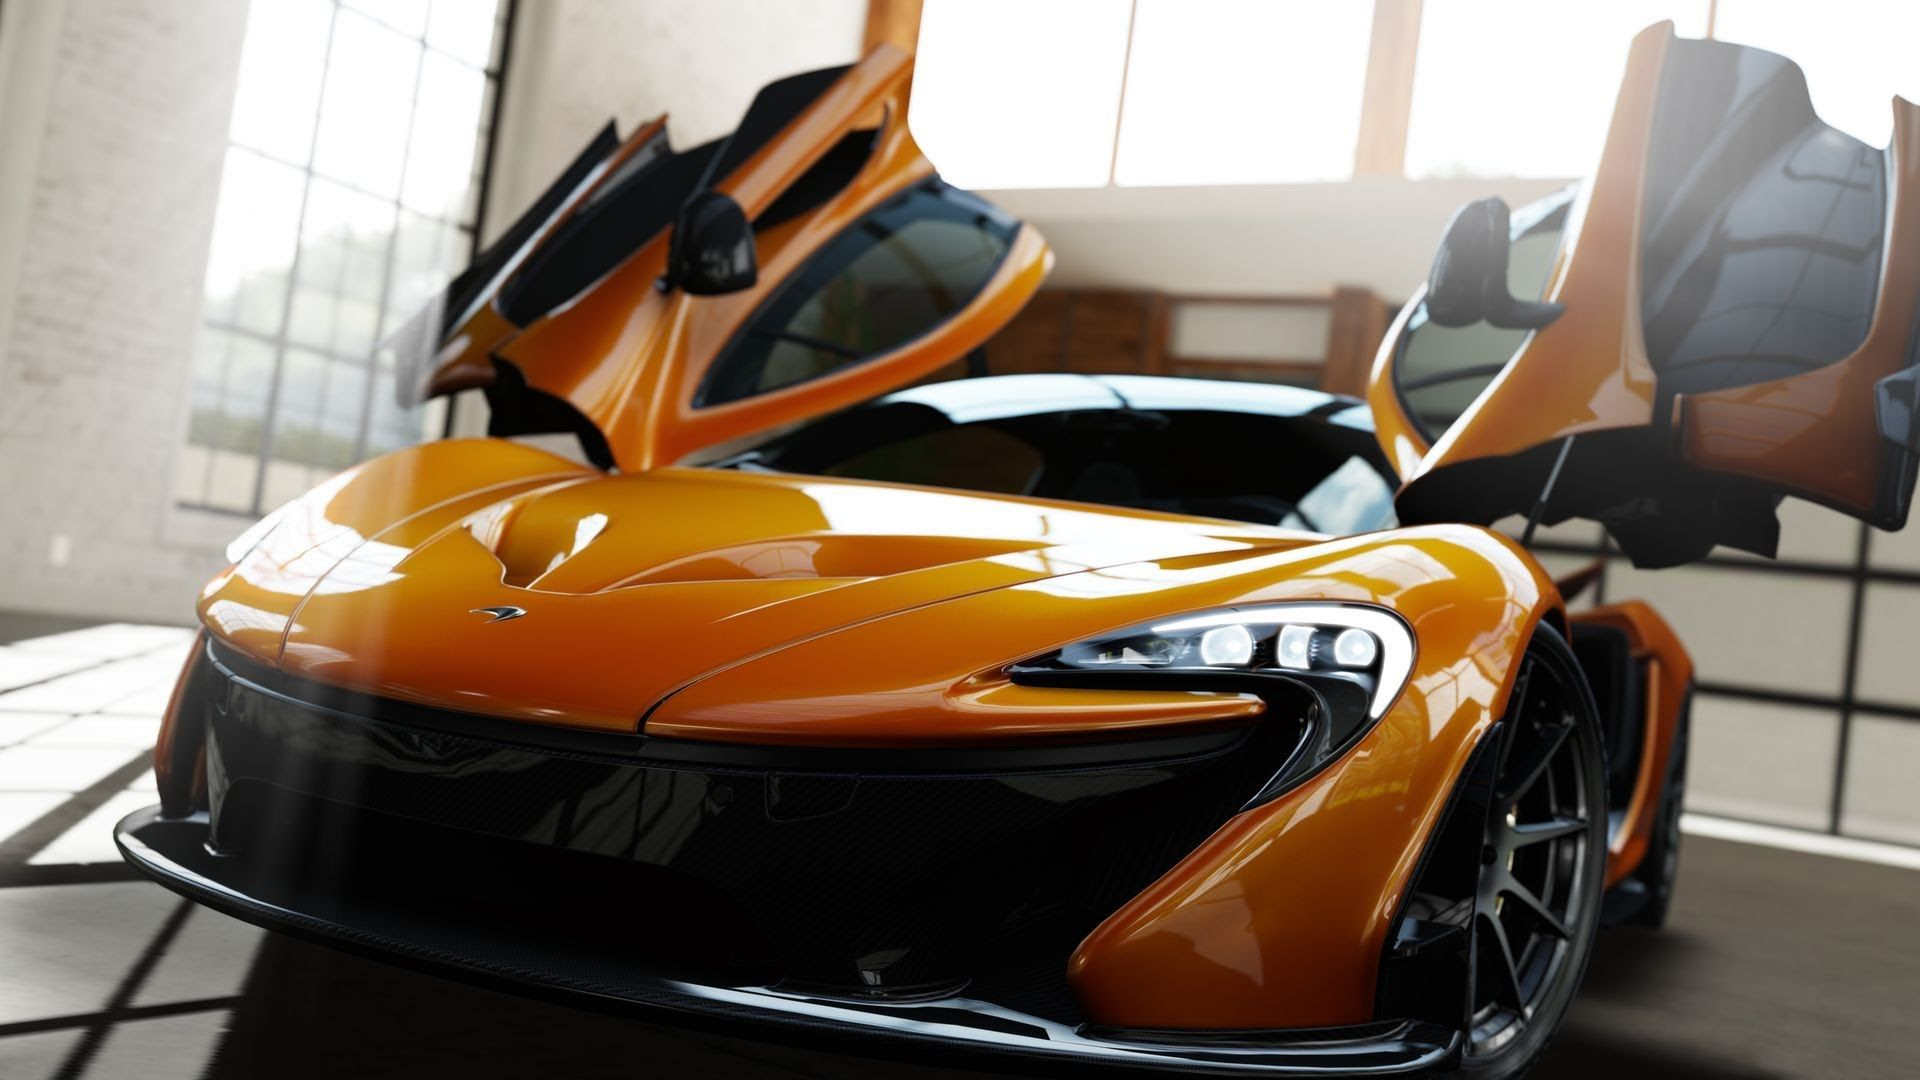 http://www.heysport.biz/ Forza Motorsport 5: E3 Gameplay Trailer